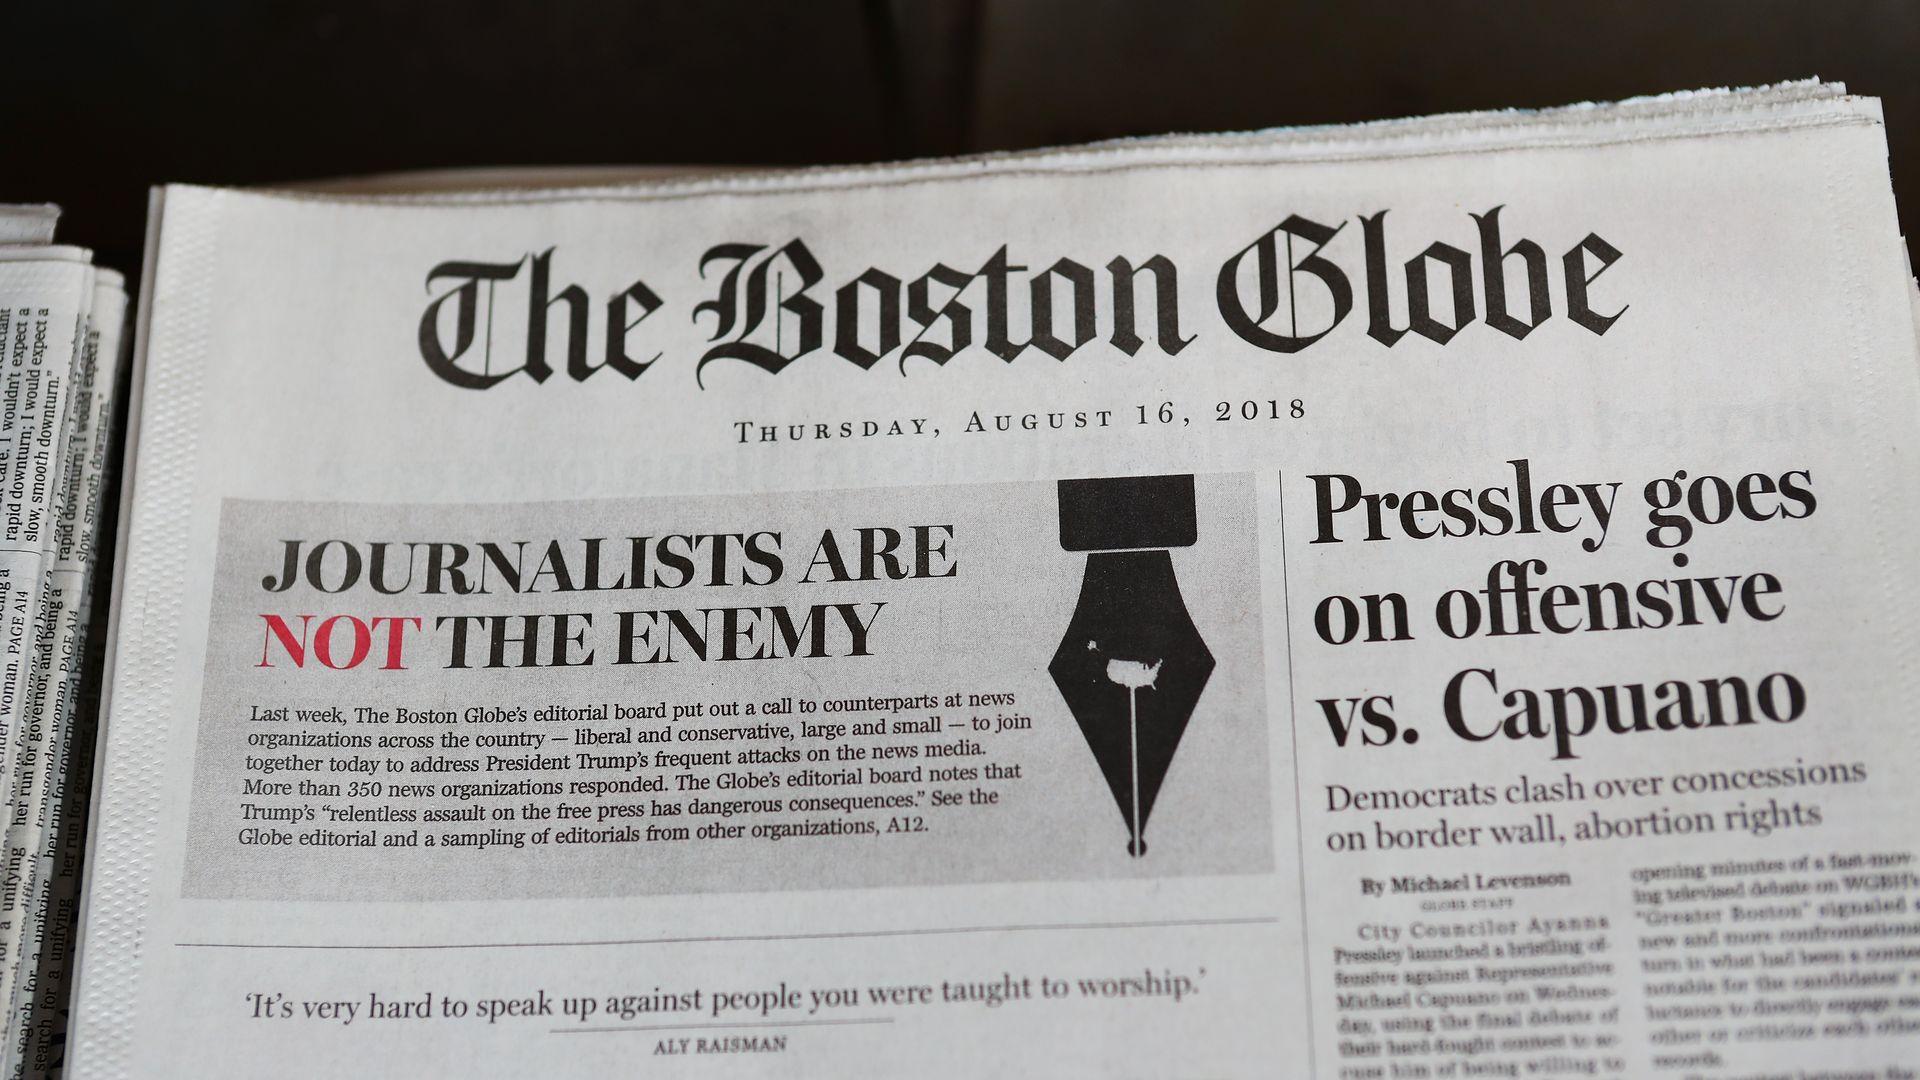 Boston Globe receives threat after anti-Trump editorial